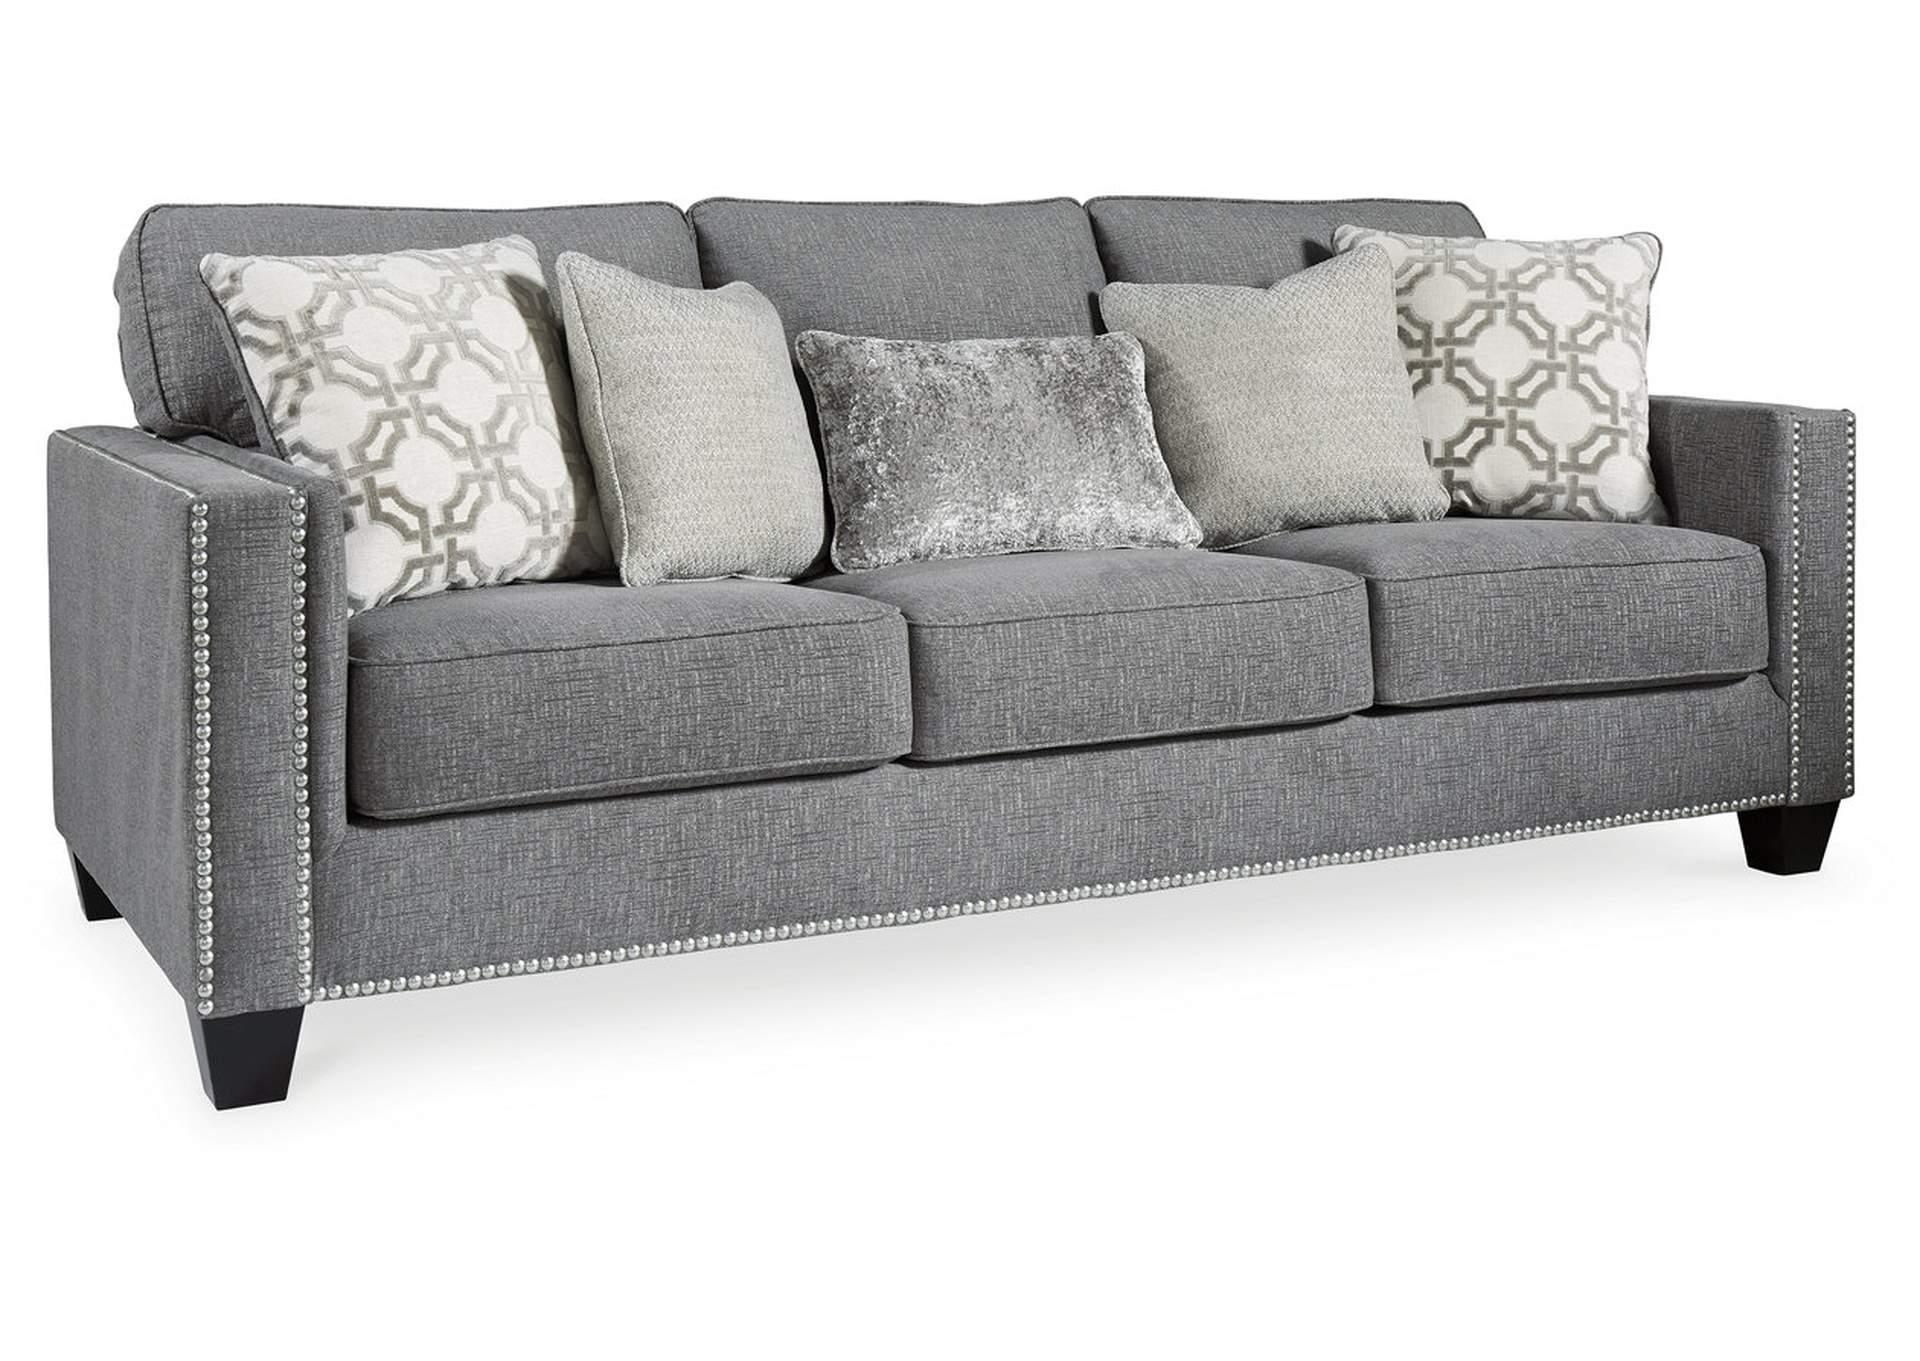 Barrali Chenille Queen Sofa Sleeper